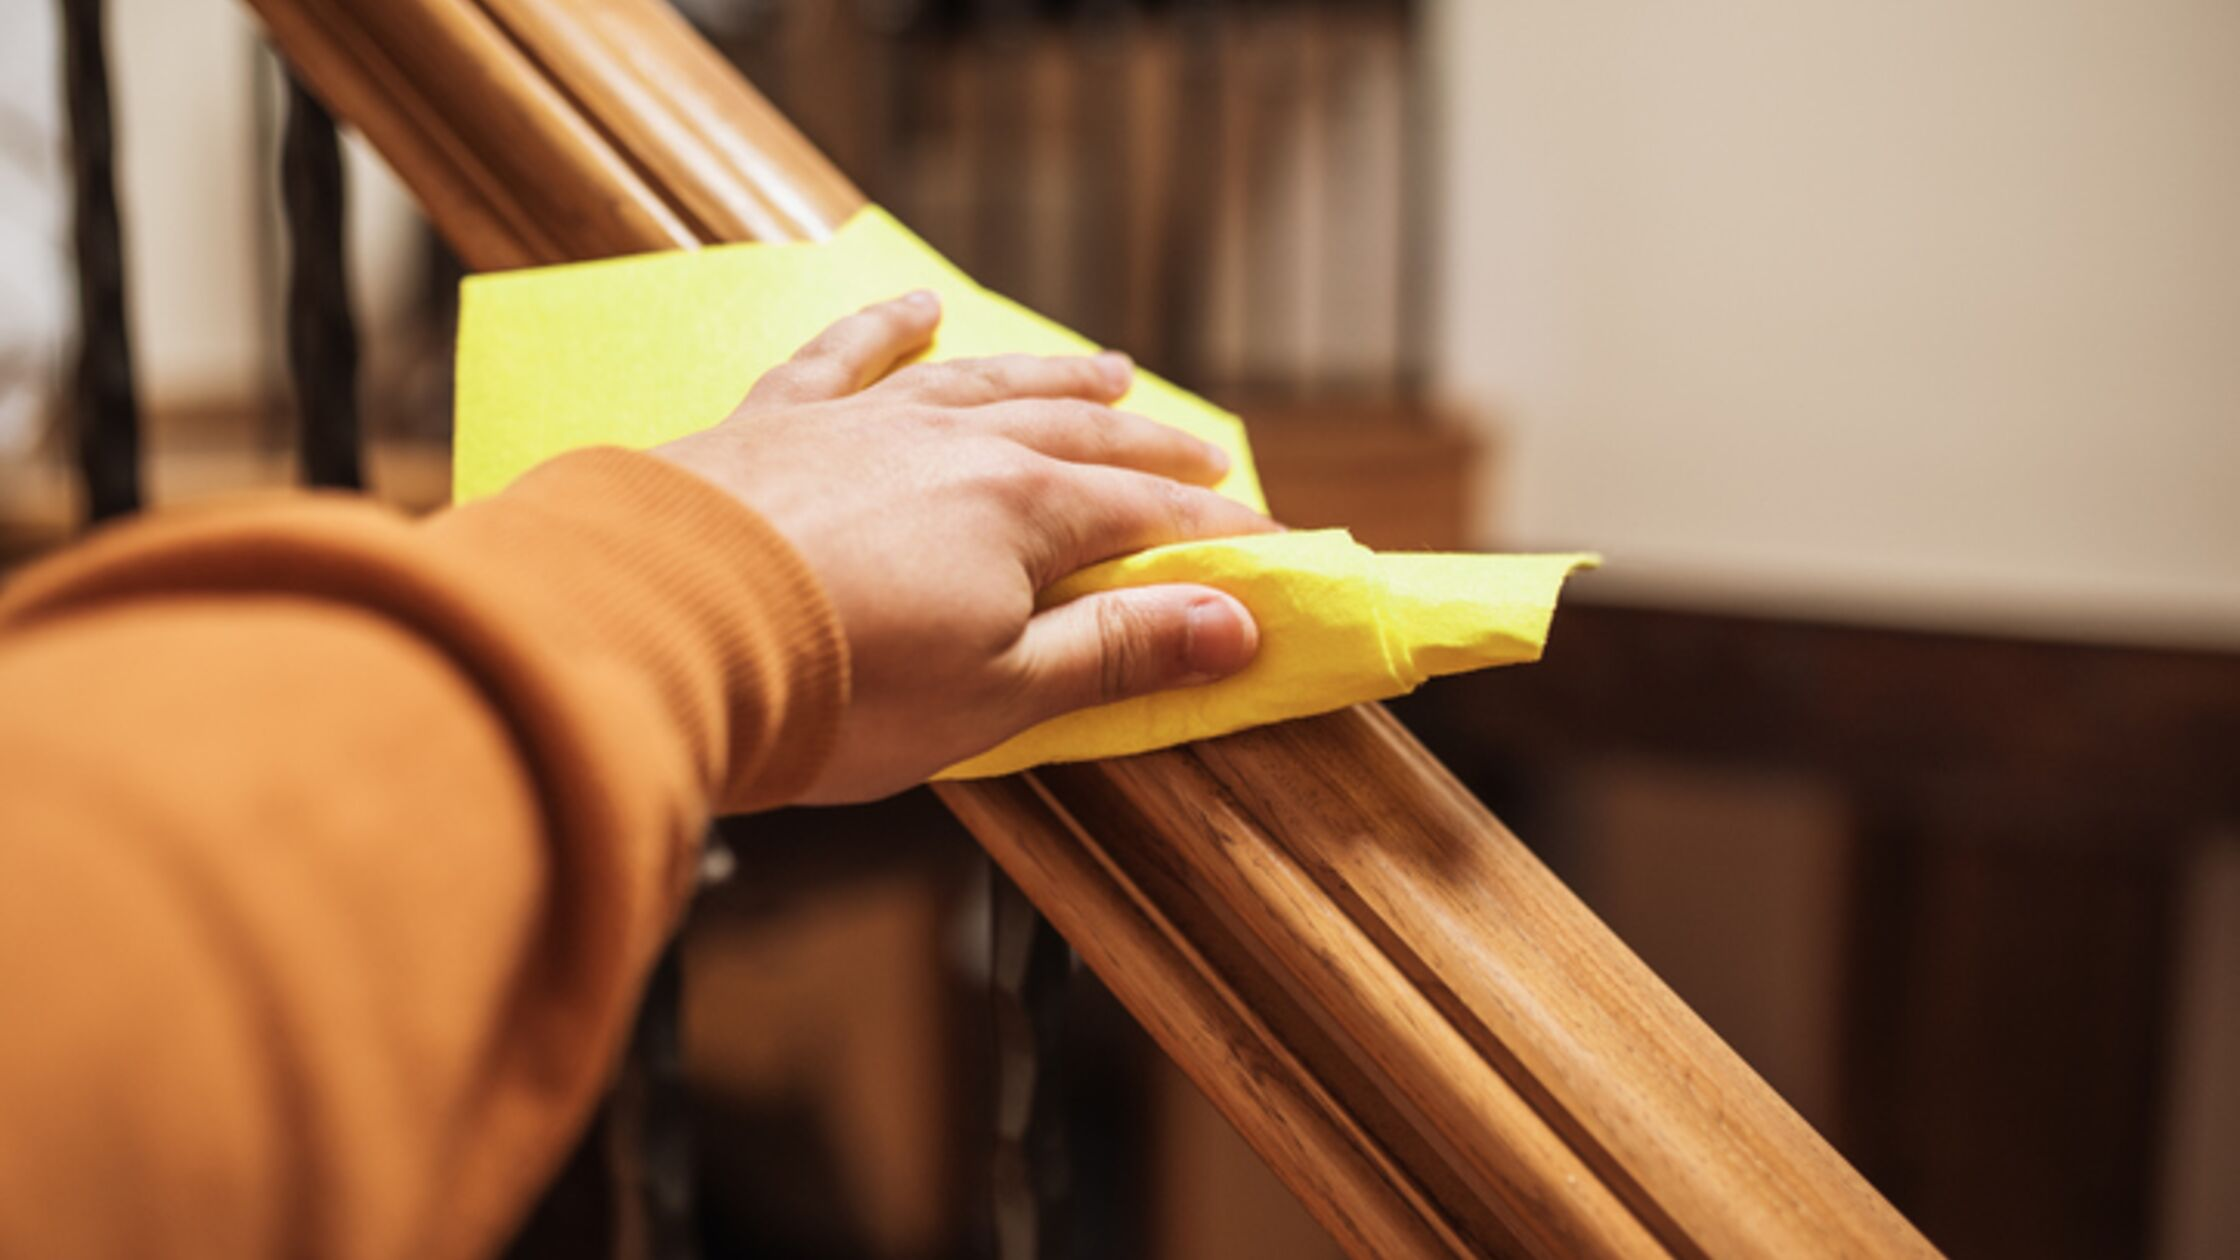 Treppenhausreinigung im Mehrfamilienhaus